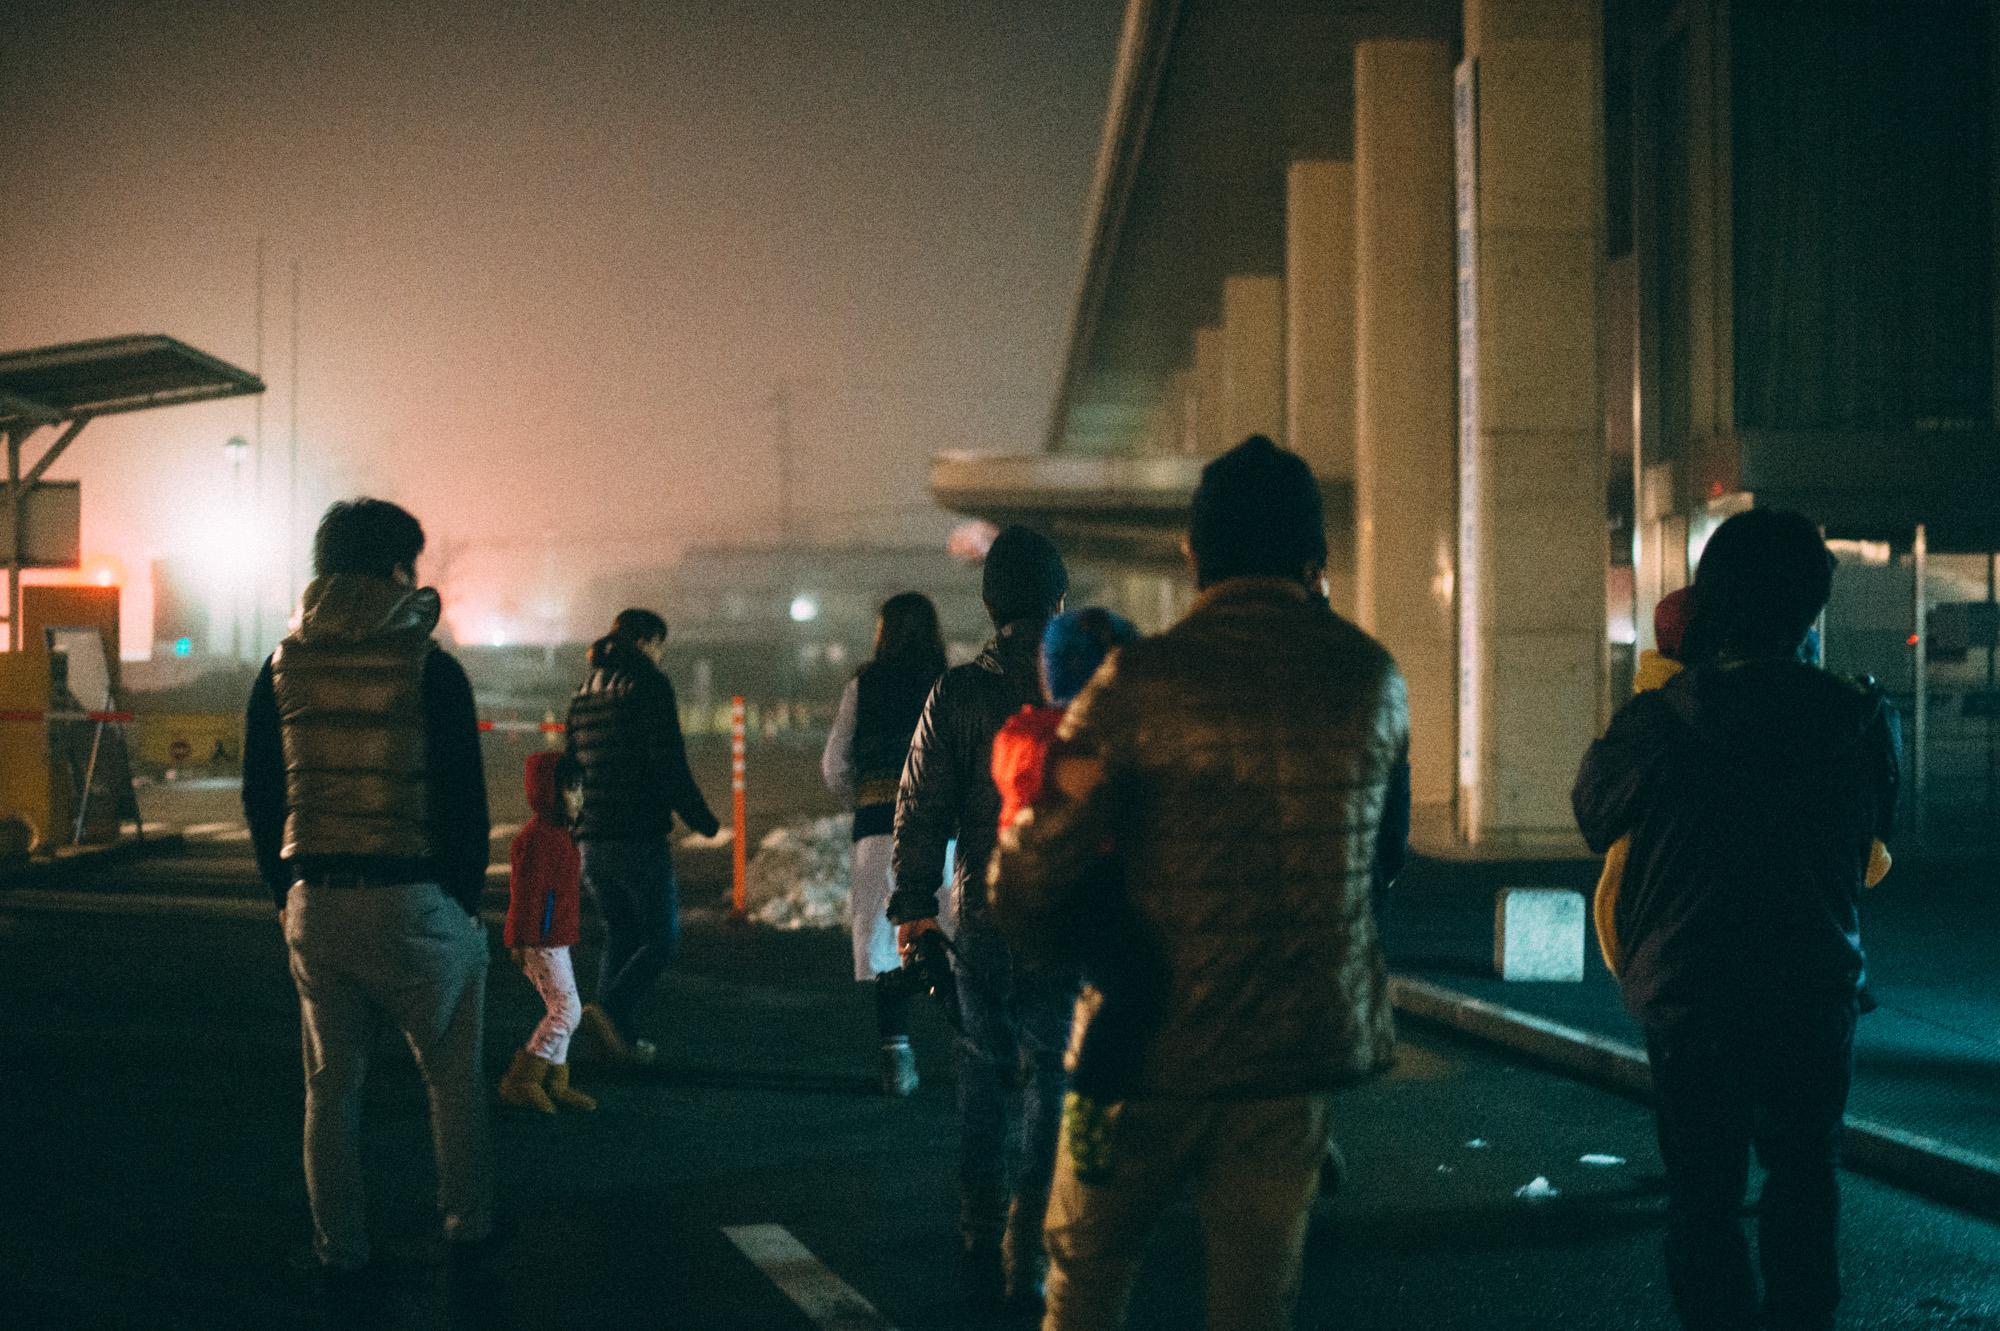 福知山前撮り91